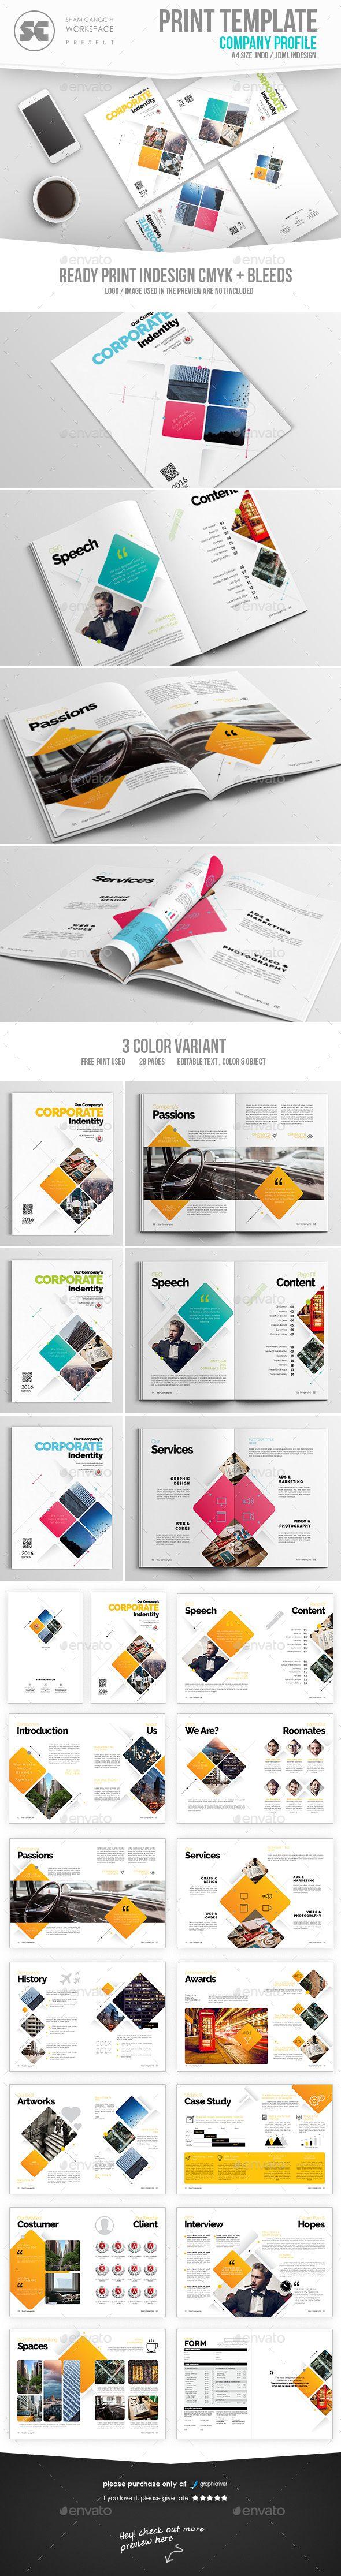 Modern Company Profile - #Corporate #Brochures Download here: https://graphicriver.net/item/modern-company-profile/19511752?ref=alena994